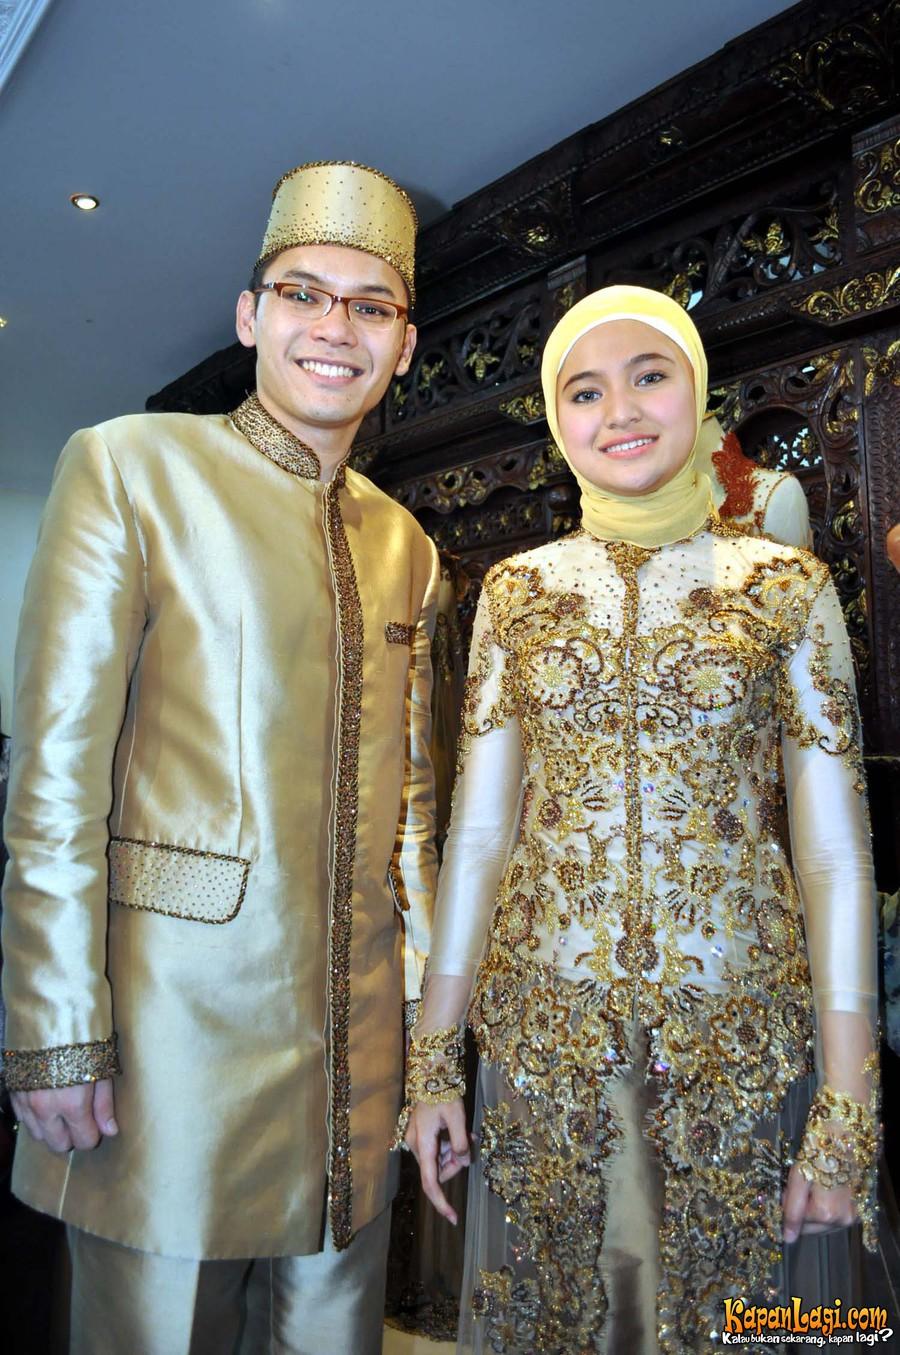 Muslimah pengantin gittewhehehe :) Can't wait for that day lah